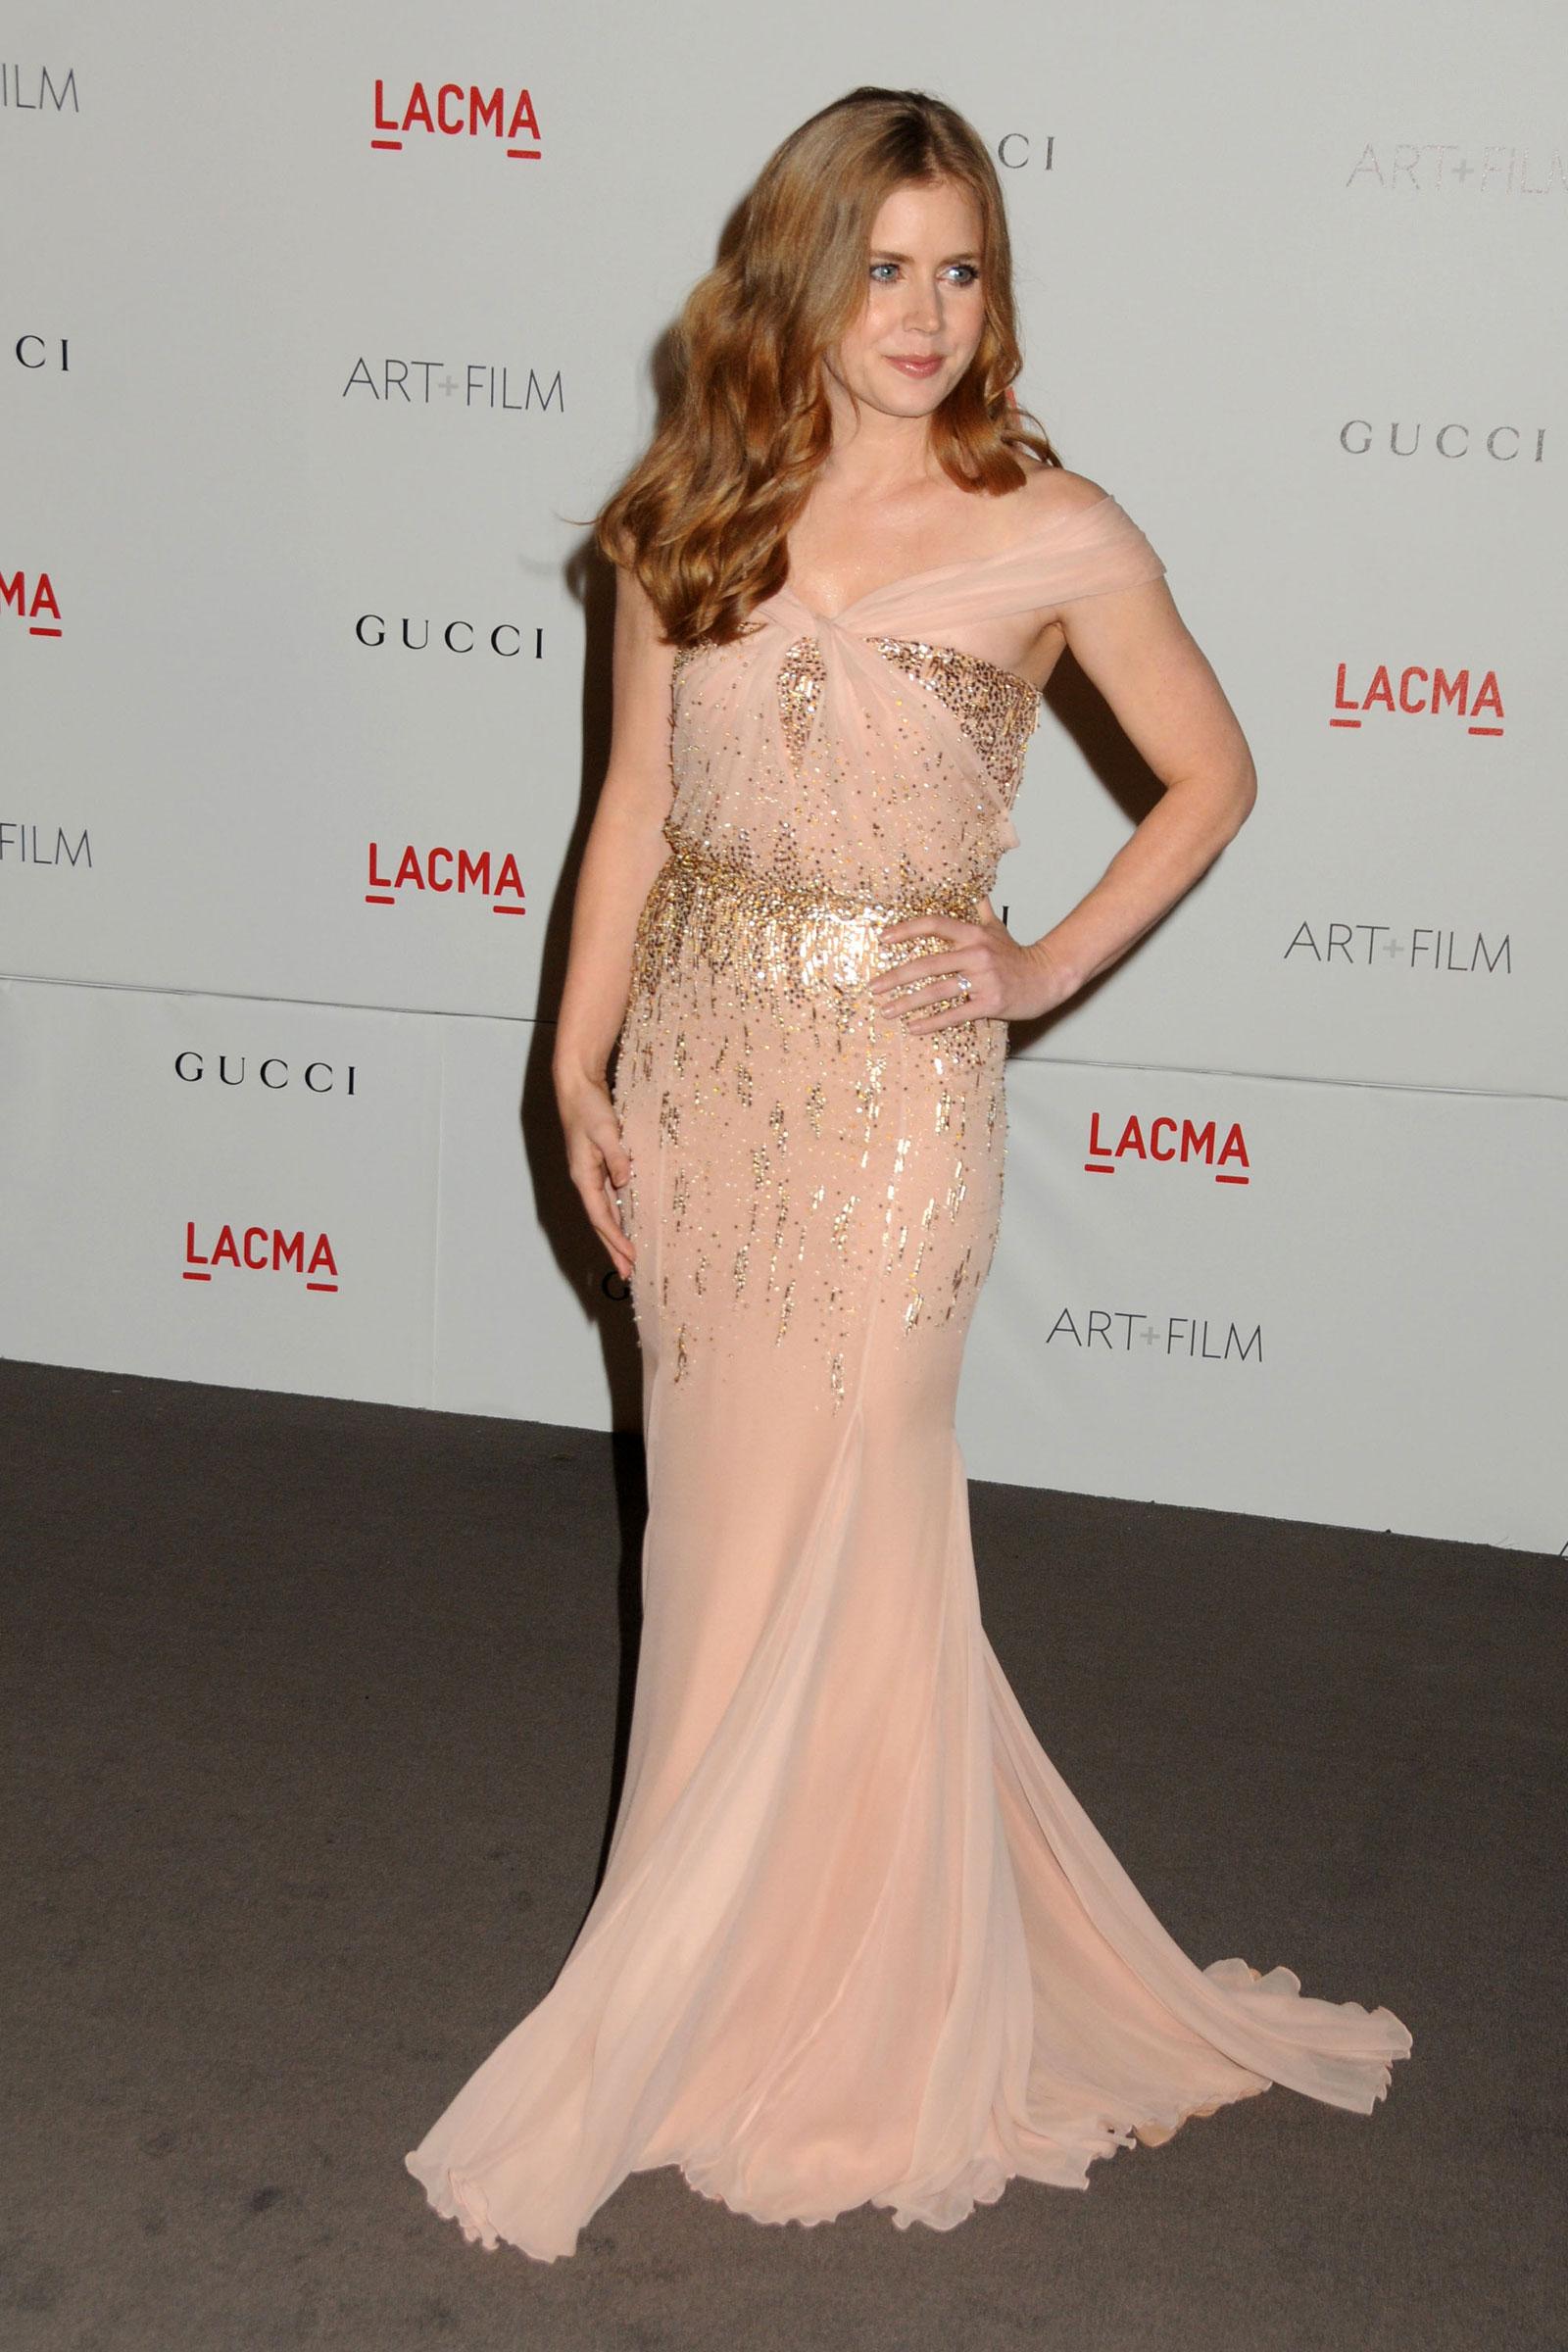 Amy Adams In Gucci - LACMA Art + Film Gala 2013 - Red